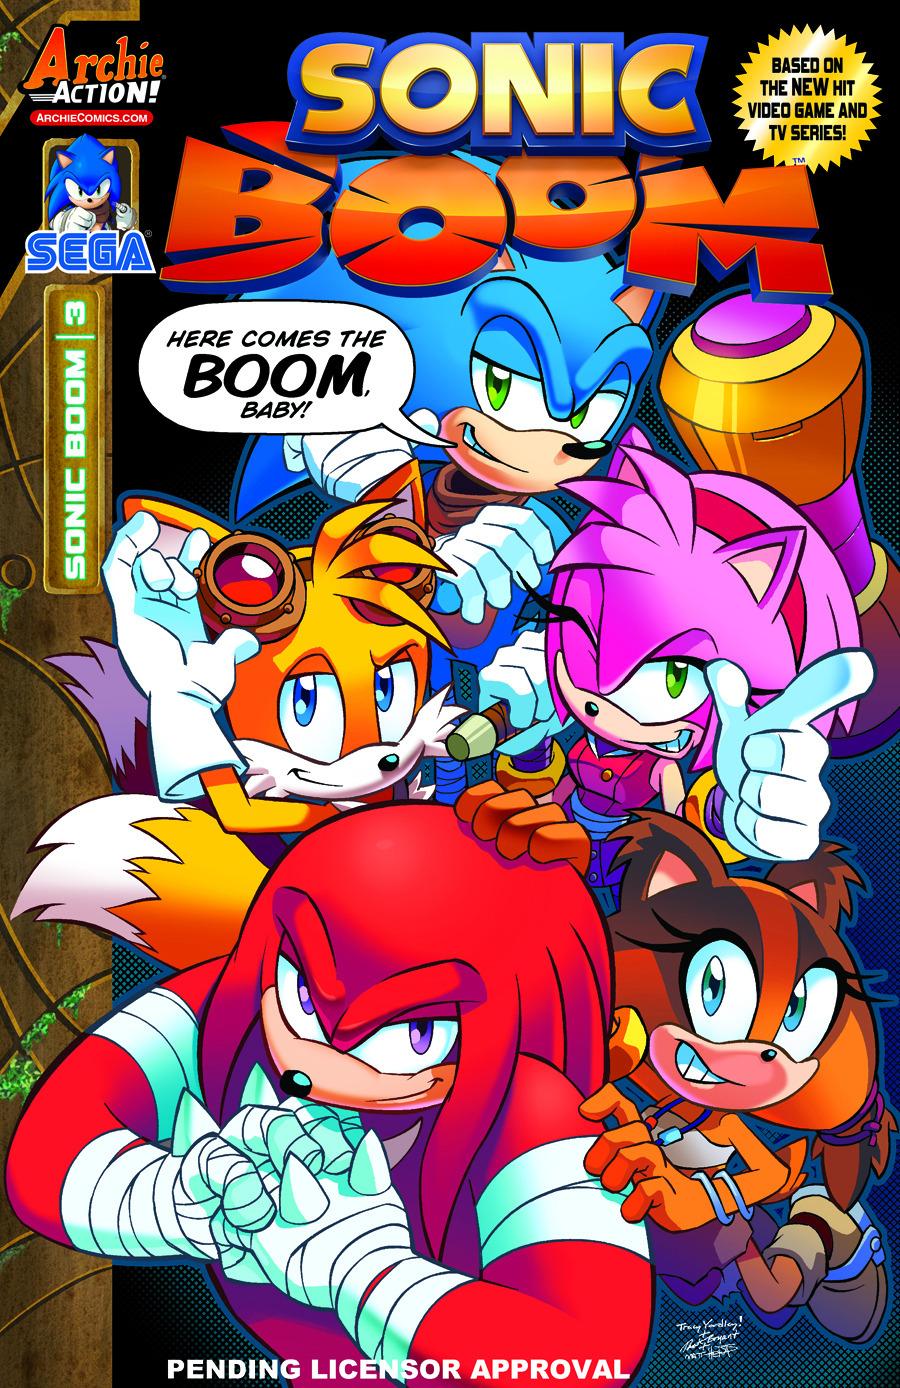 Archie Sonic Boom Issue 3 - Mobius Encyclopaedia - Sonic ...